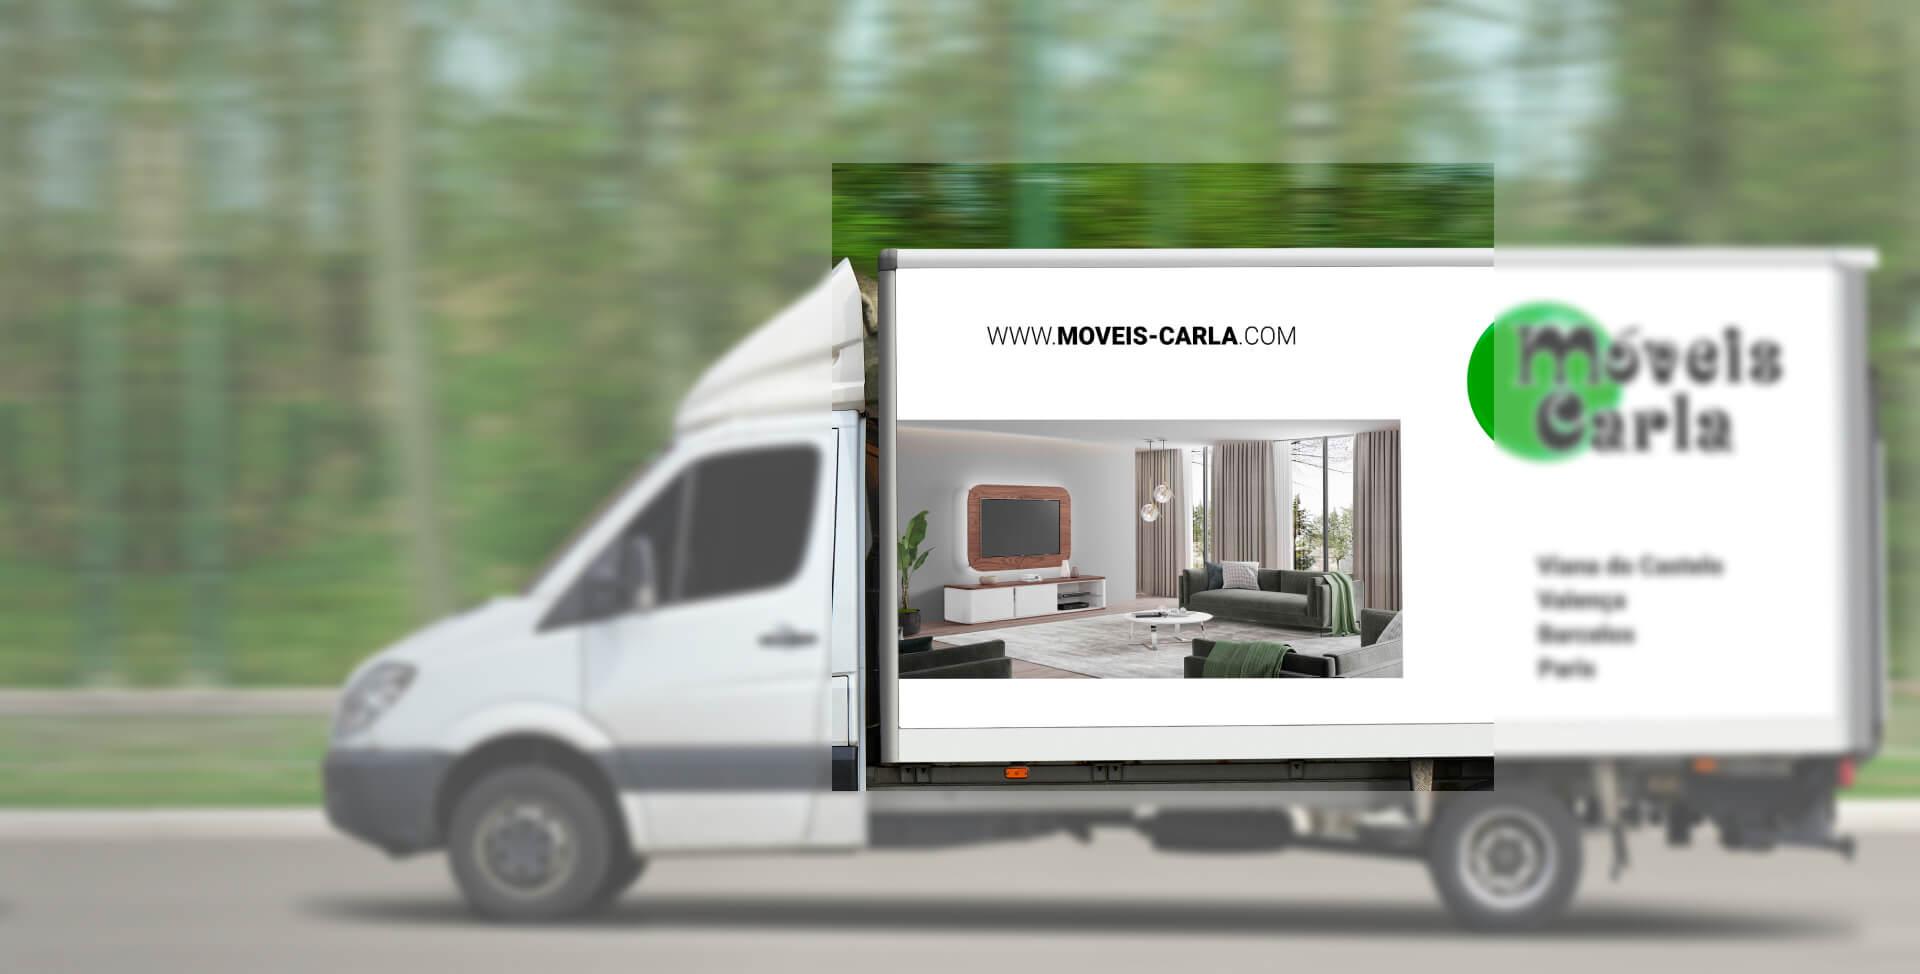 transporte-gratis-moveis-carla